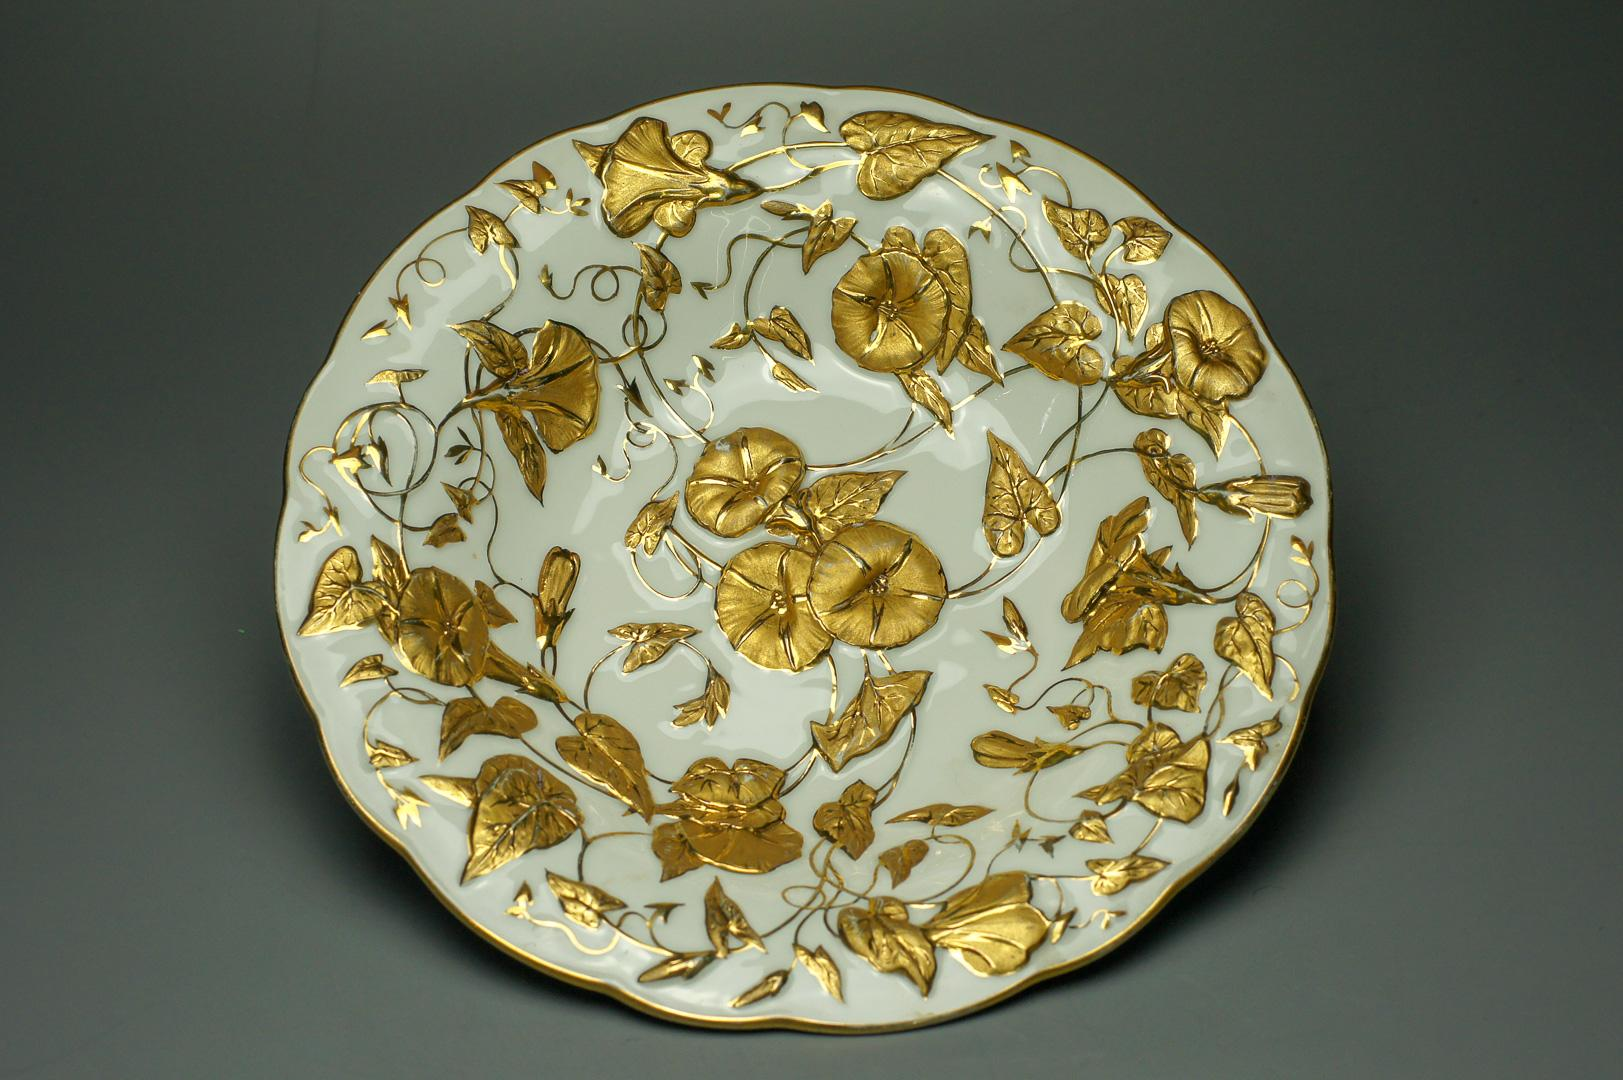 Тарелка с золотым лепным декором Мейсен